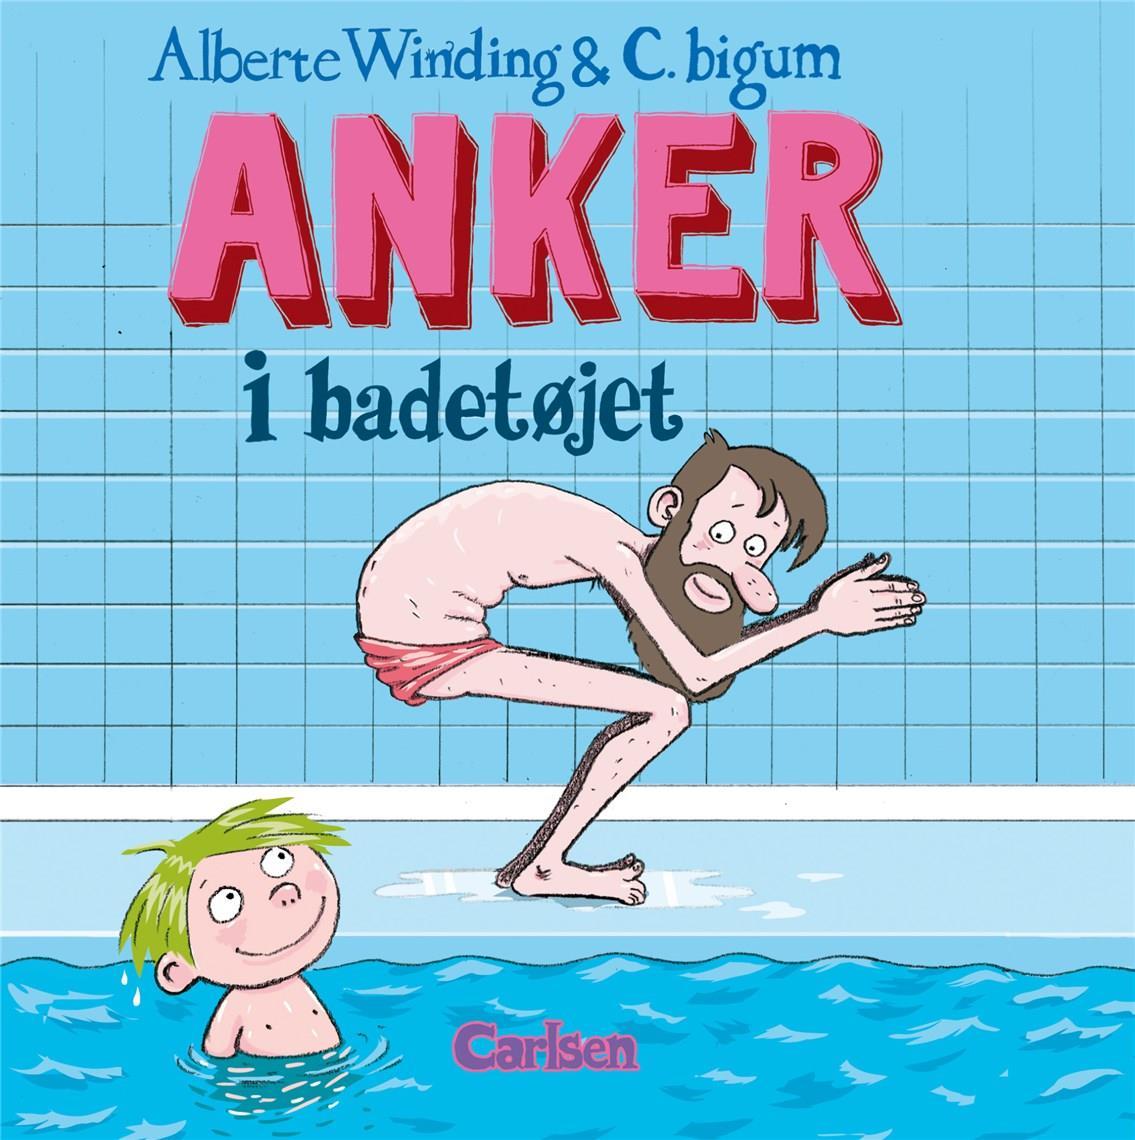 Anker: Anker (6) - Anker i badetøjet - Alberte Winding - Bøger - CARLSEN - 9788711984024 - 11/8-2020